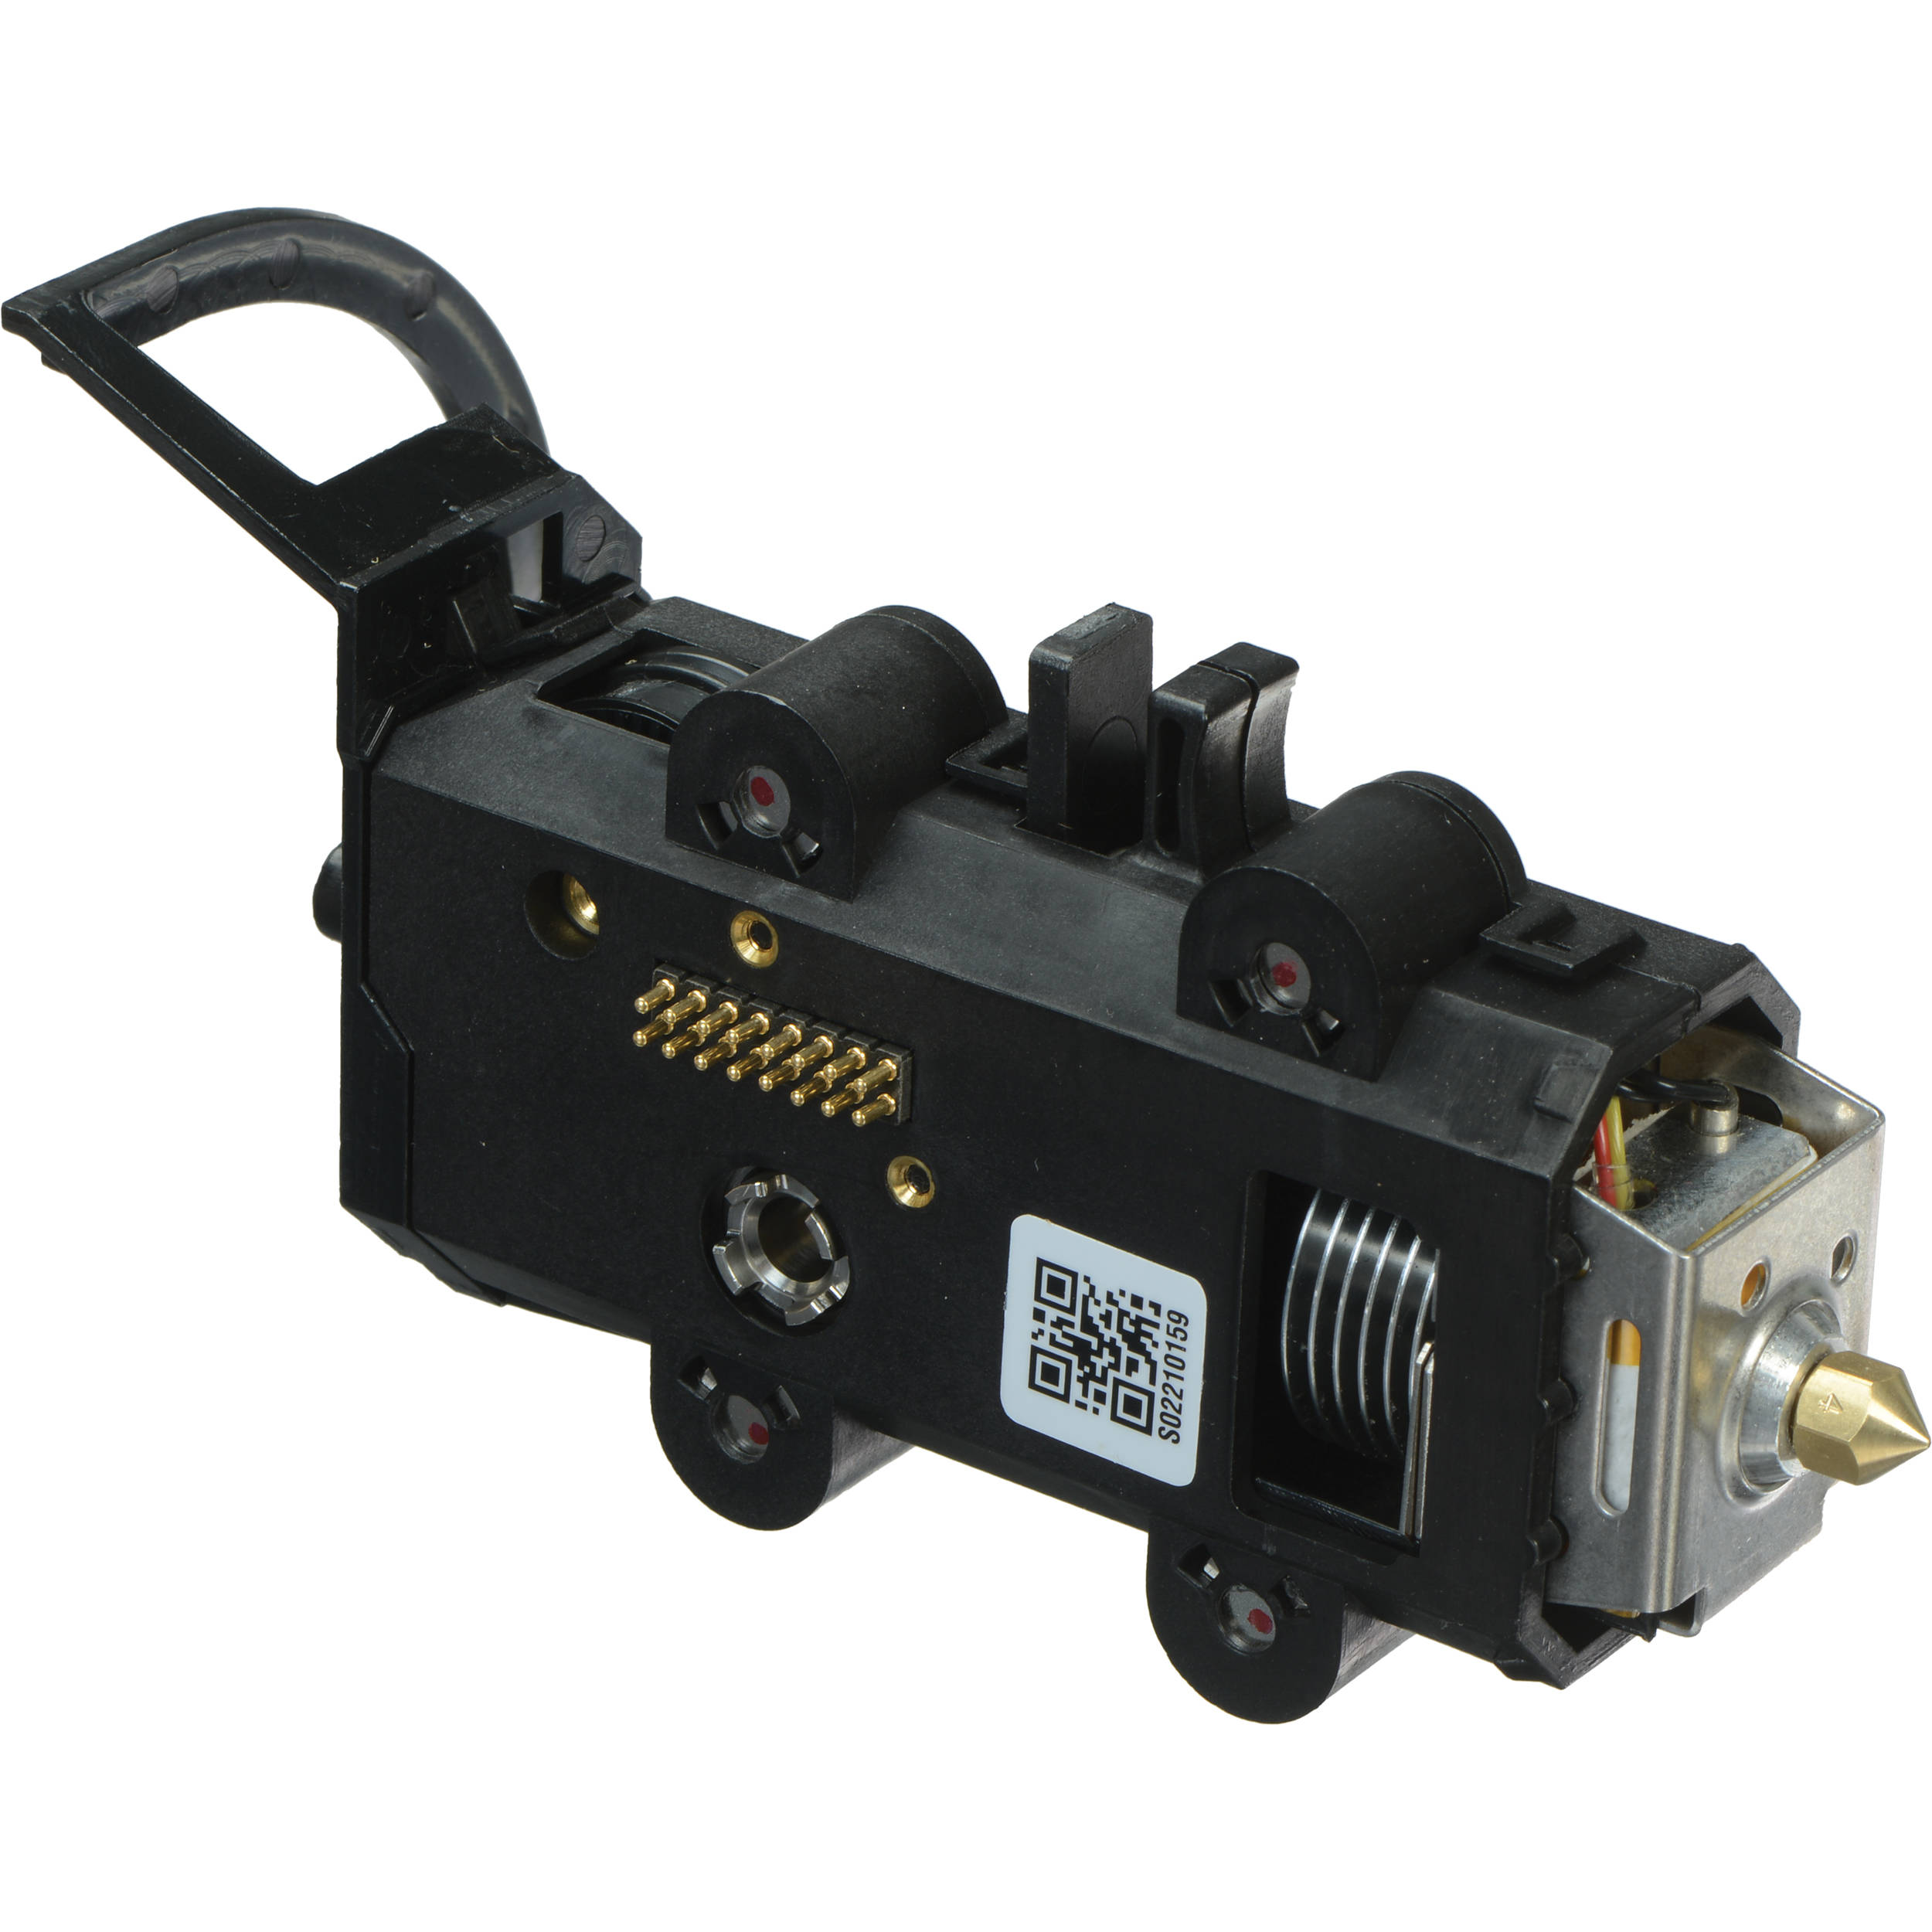 MakerBot Replicator Z18 Smart Extruder